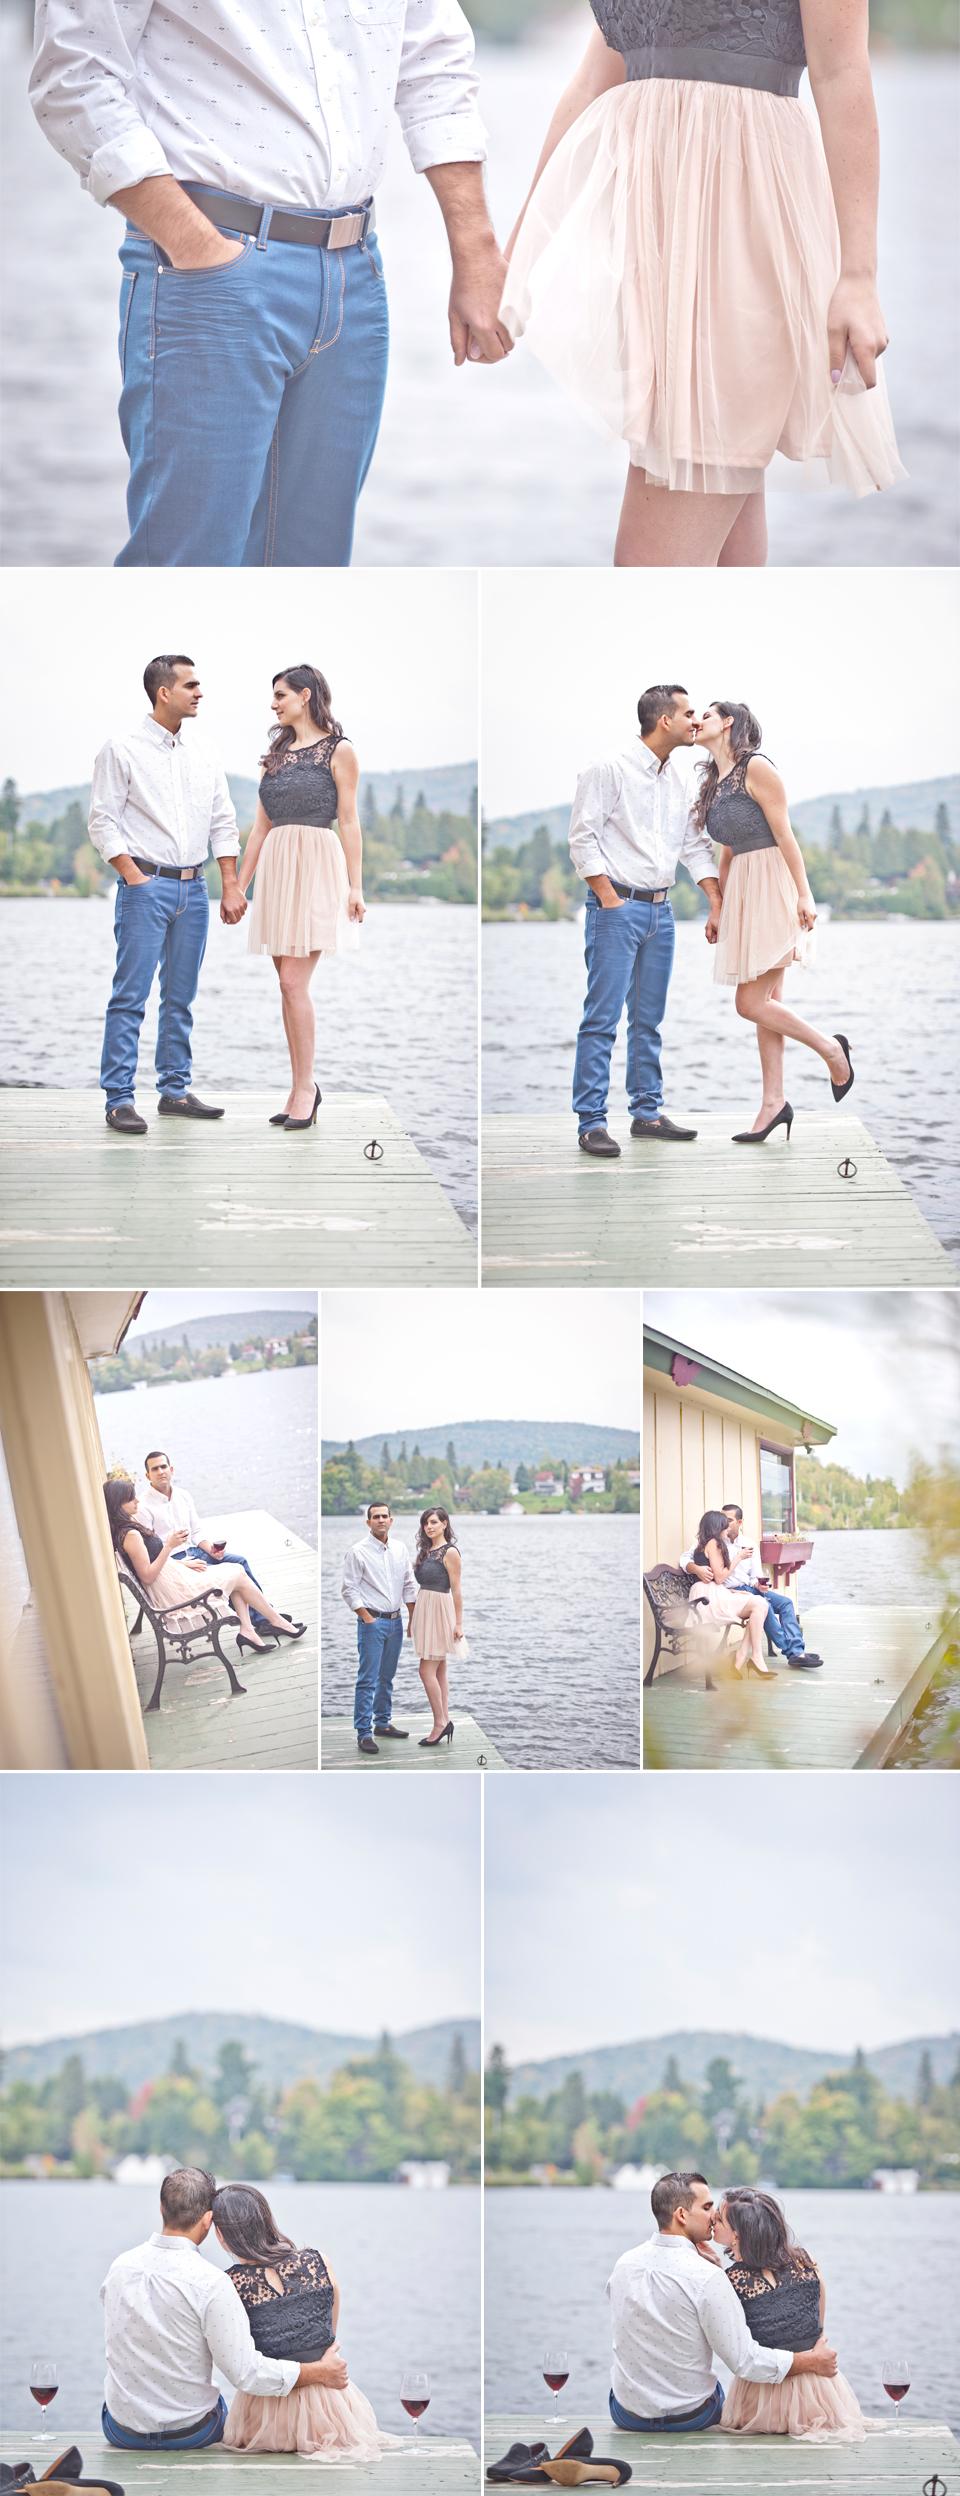 Montreal Wedding Photographer   Engagement Photo   Sainte-Agathe-des-Monts Quebec   Lake   LMP wedding photography and videography